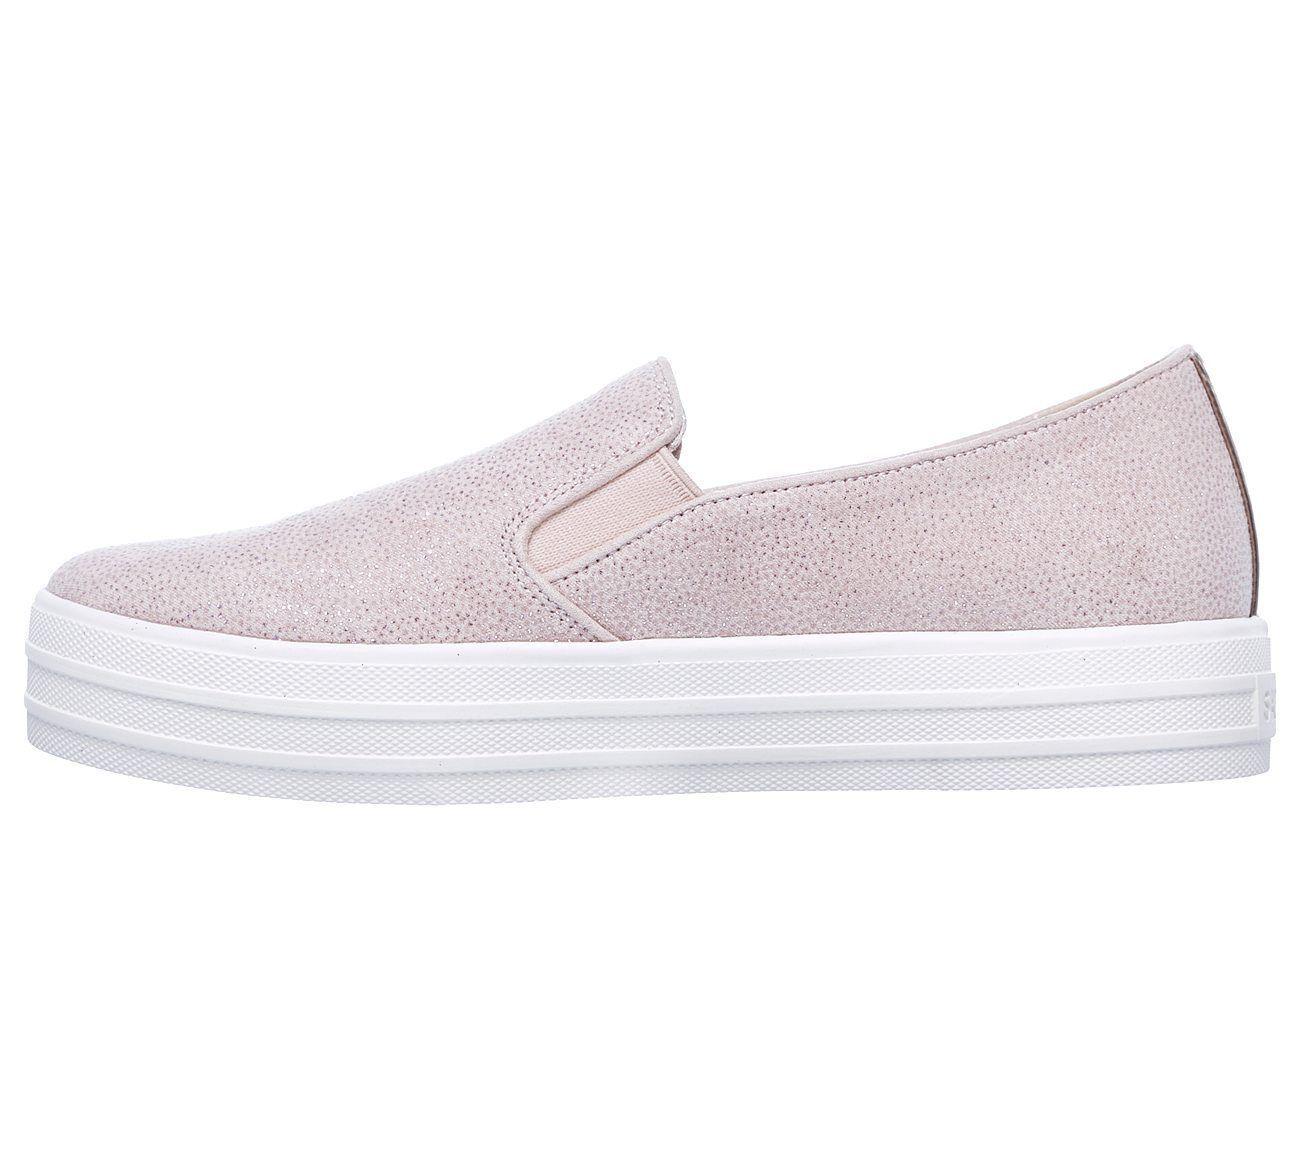 794 Rosa Skechers Schuhe Damen Memory Foam ohne Bügel Plateau Glitzer Sneaker